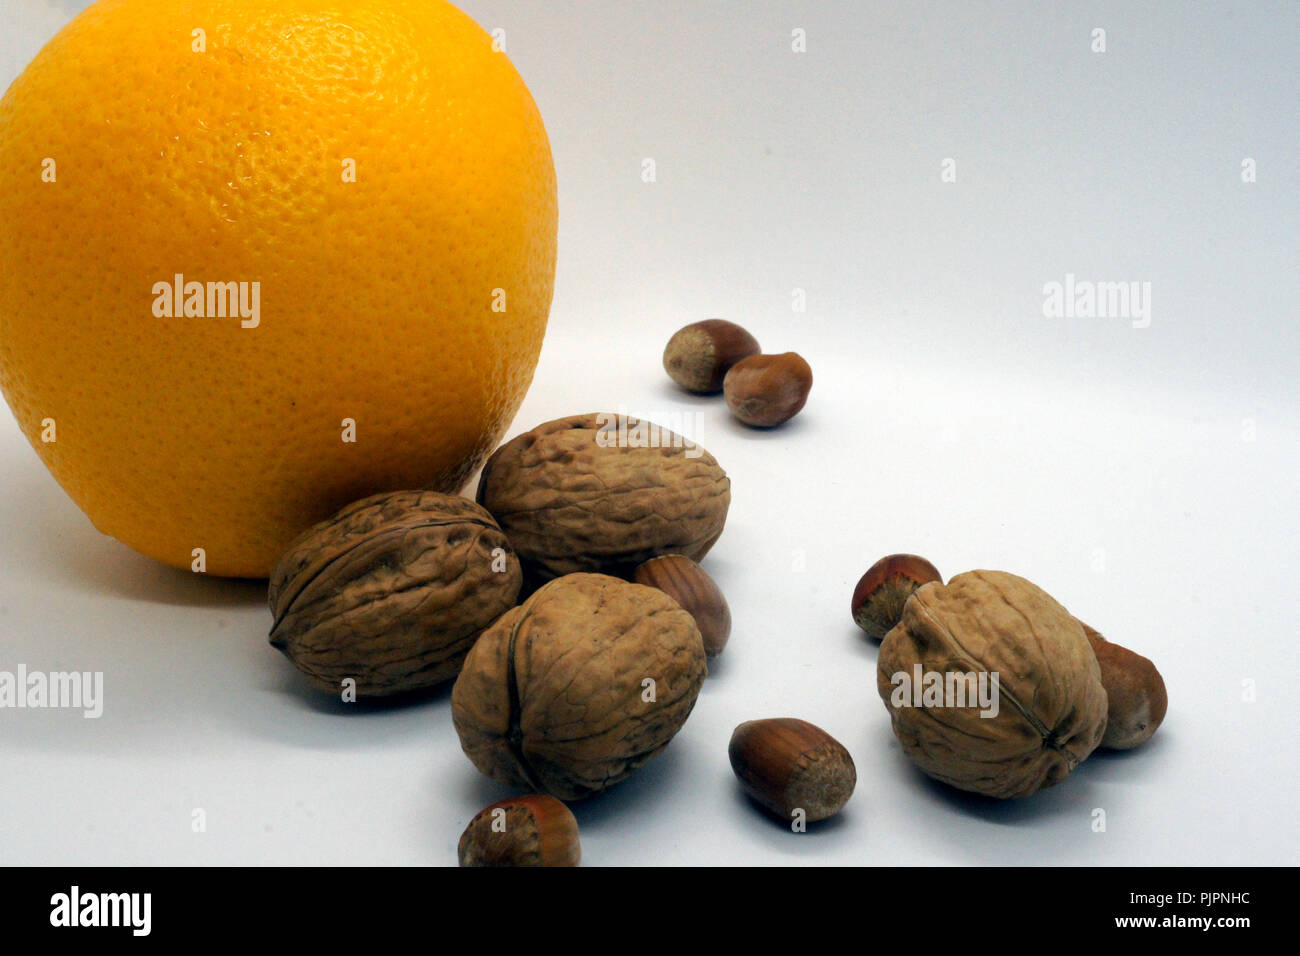 walnuts hazelnuts and orange - Stock Image